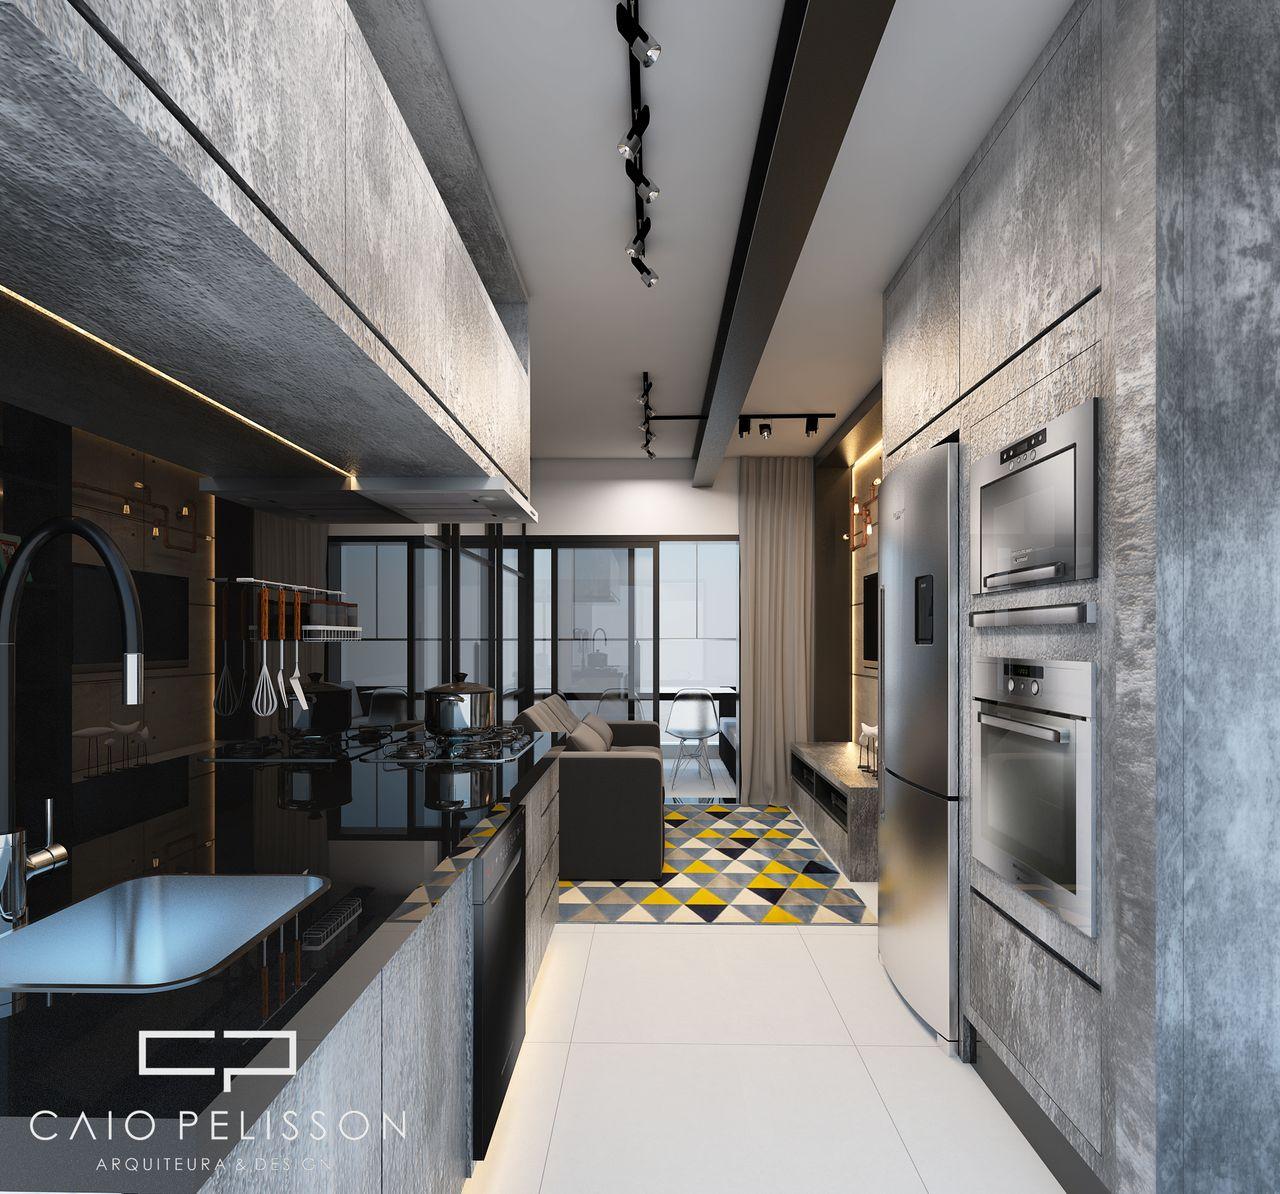 Cozinha Estilo Industrial De Arquiteto Caio Pelisson 154385 No